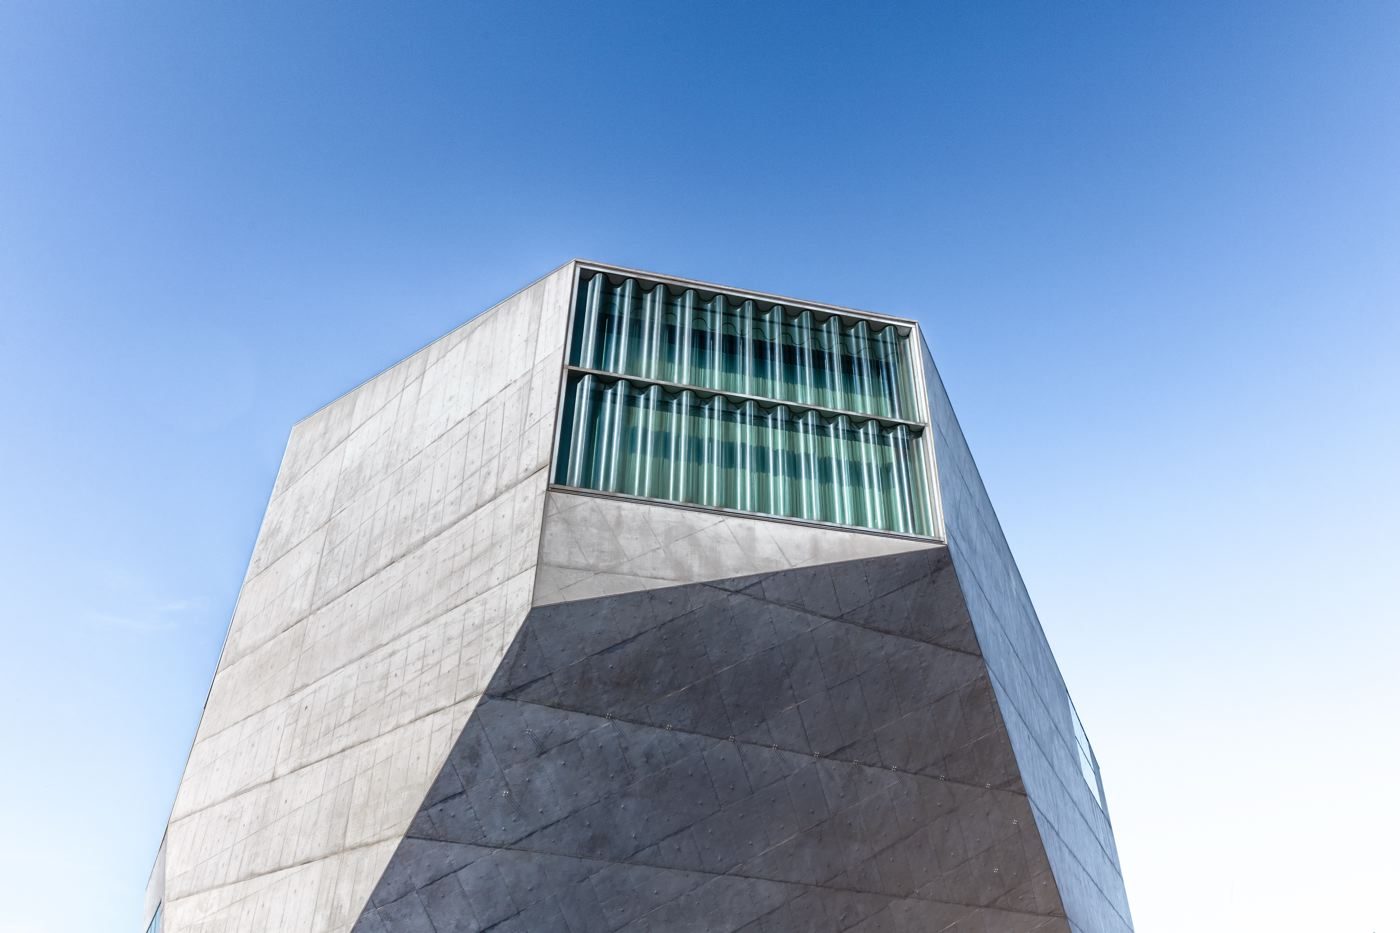 LDKphoto_PORTO-Casa da Musica-031.jpg